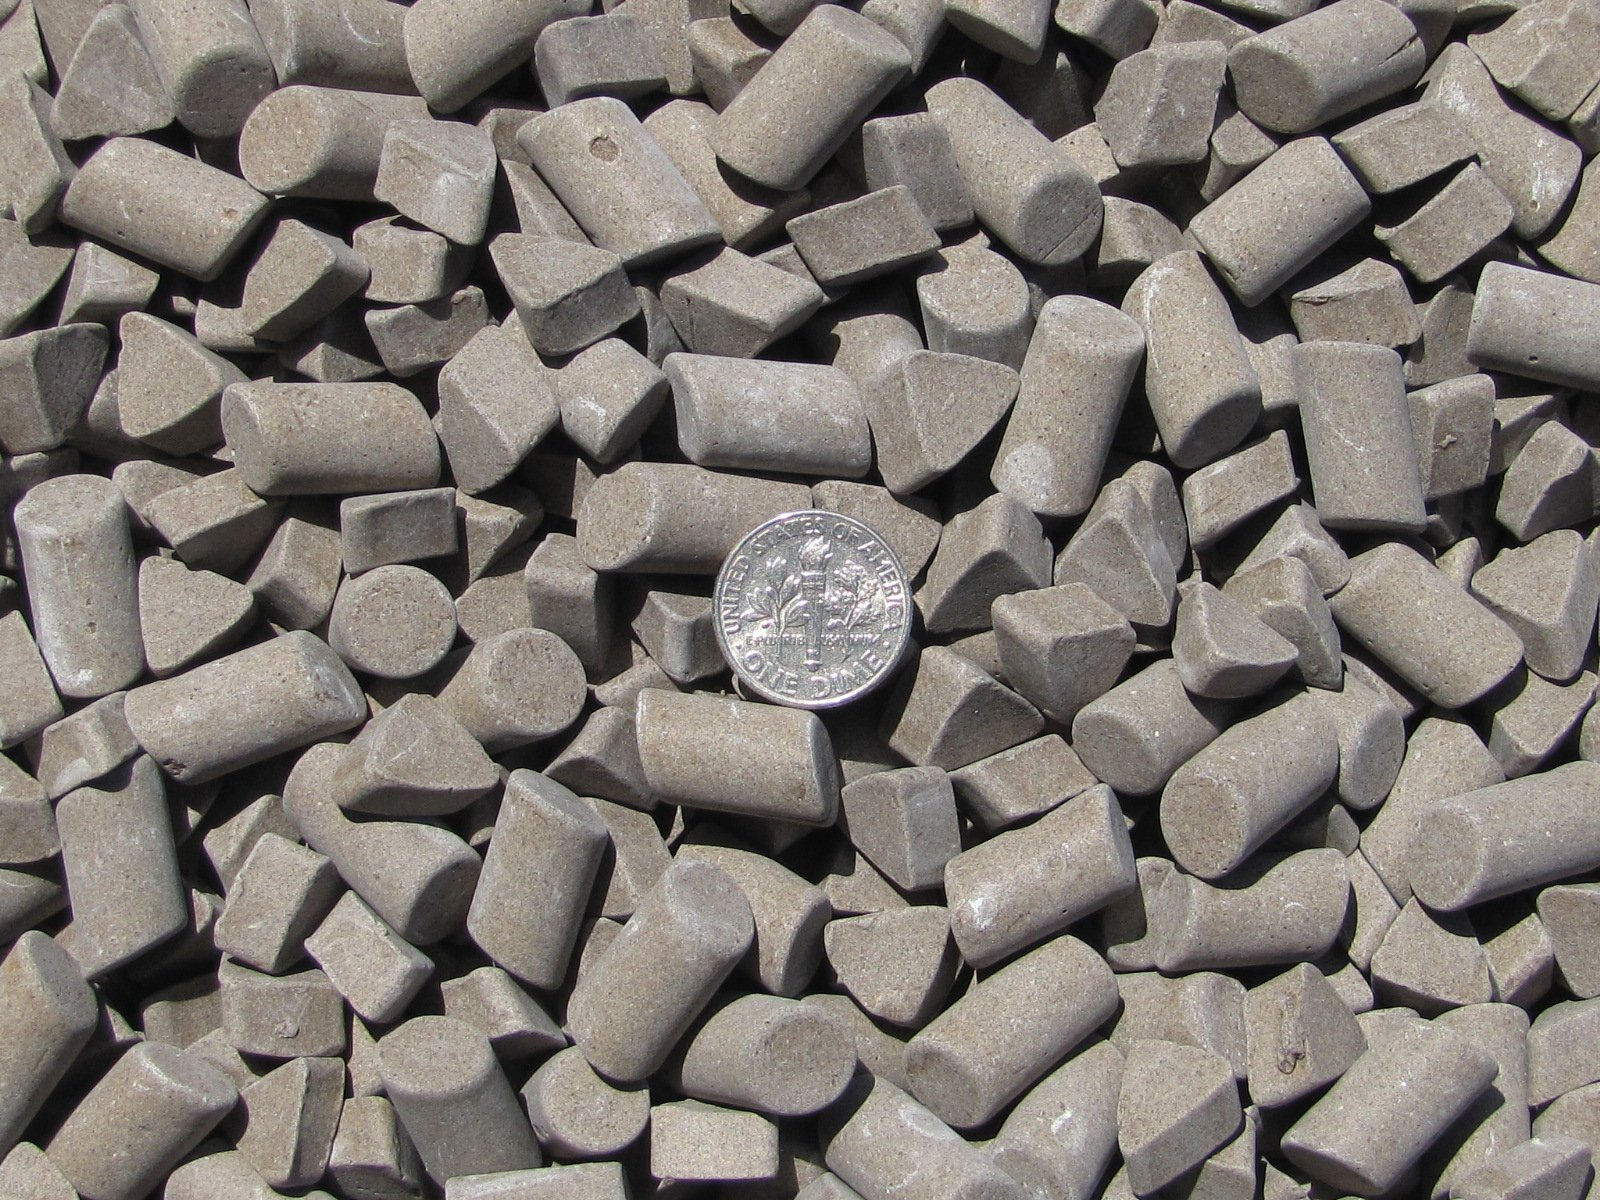 Ceramic Tumbling Media 12 Lbs. 3/8'' X 5/8'' Cylinder & 3/8'' X 1/4'' Triangle (DF) dense fast-cut – Brown – Abrasive Mixed Lapidary Rock Tumbler Tumble